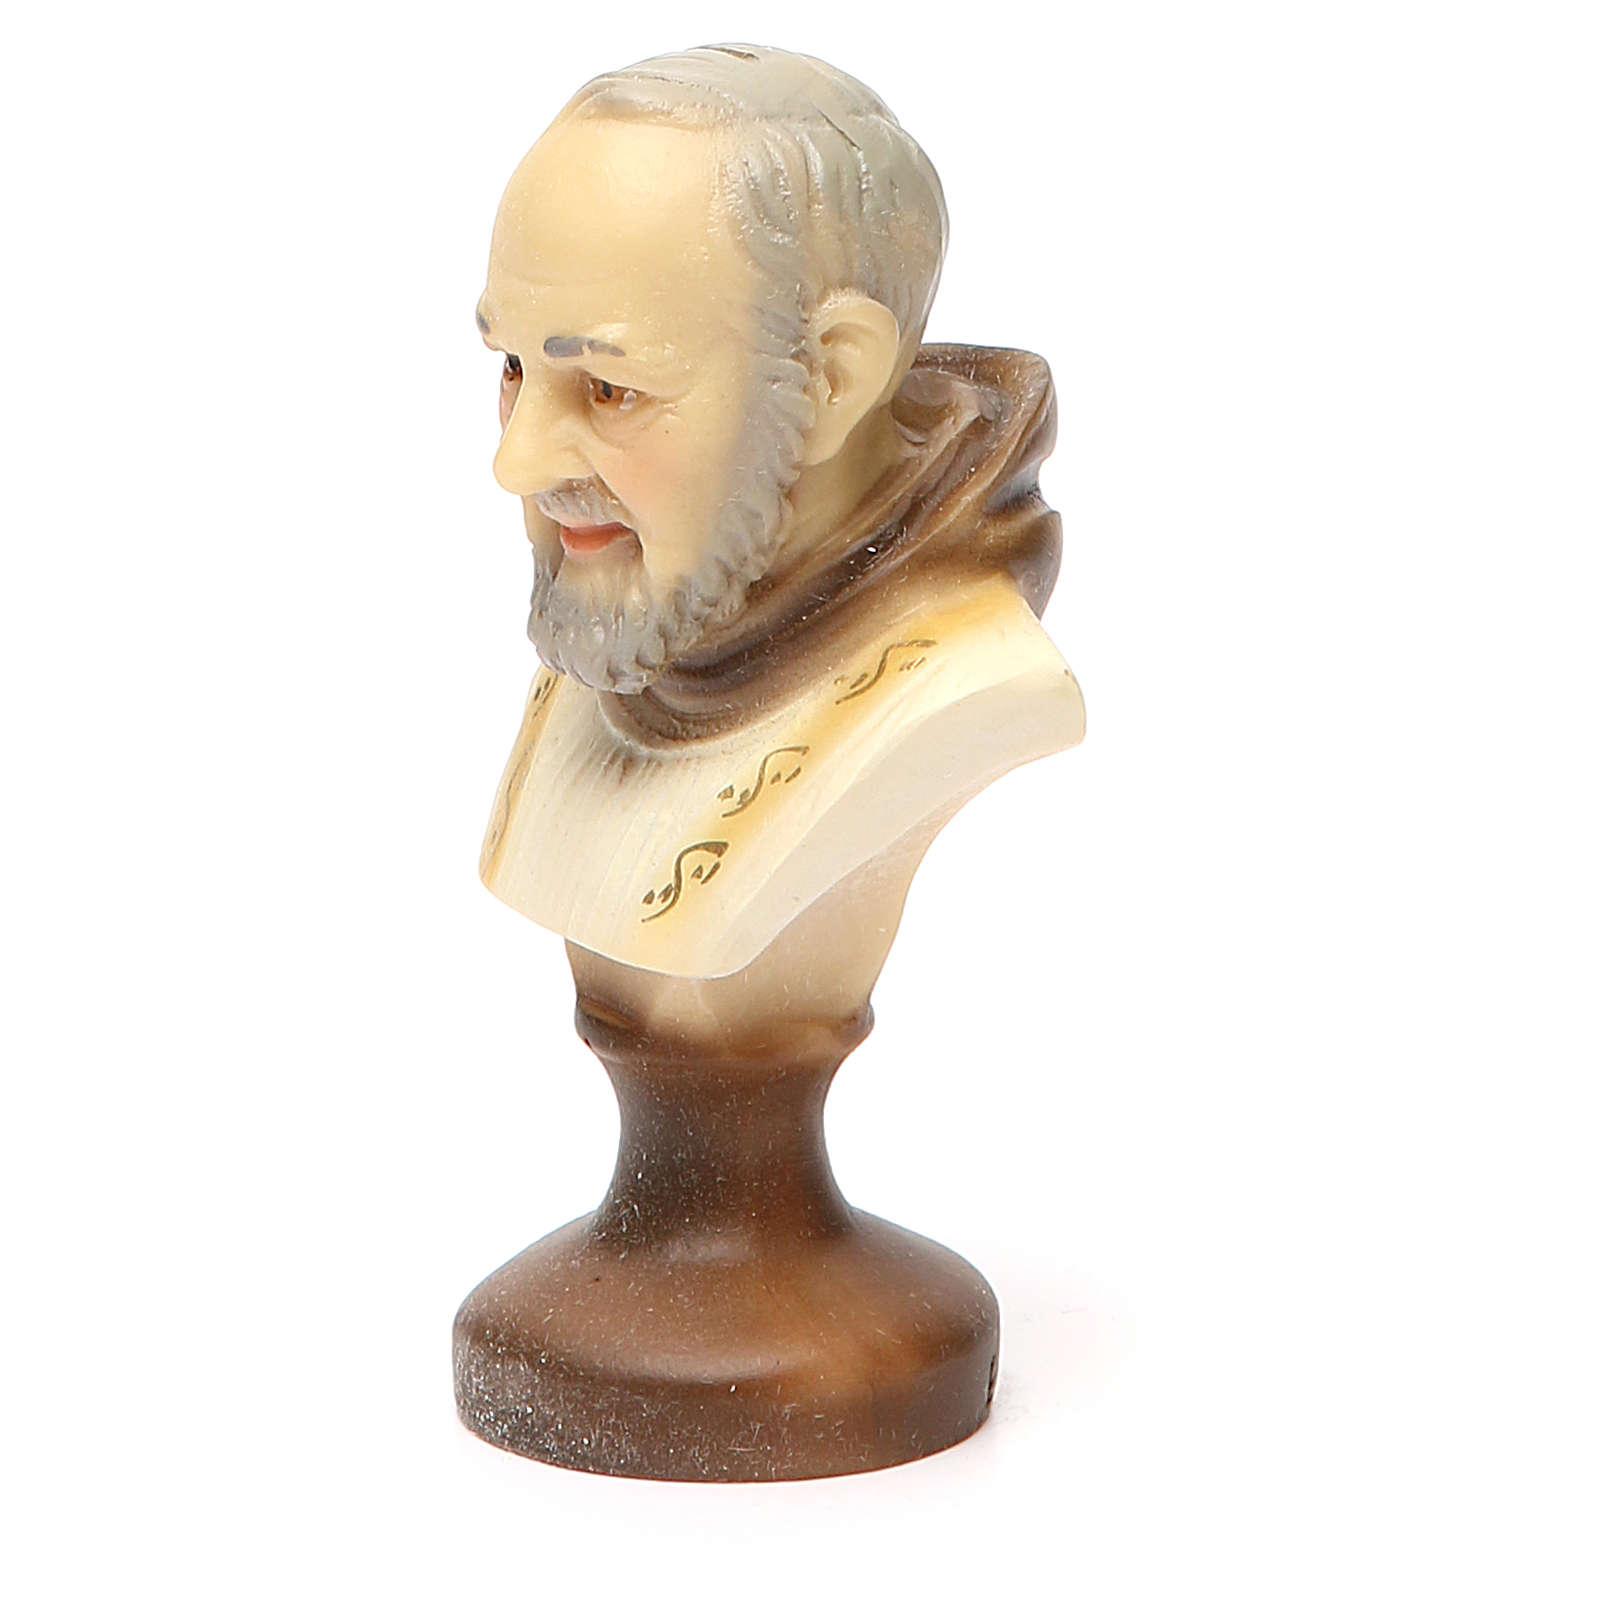 STOCK Padre Pio bust gypsum 10 cm 4